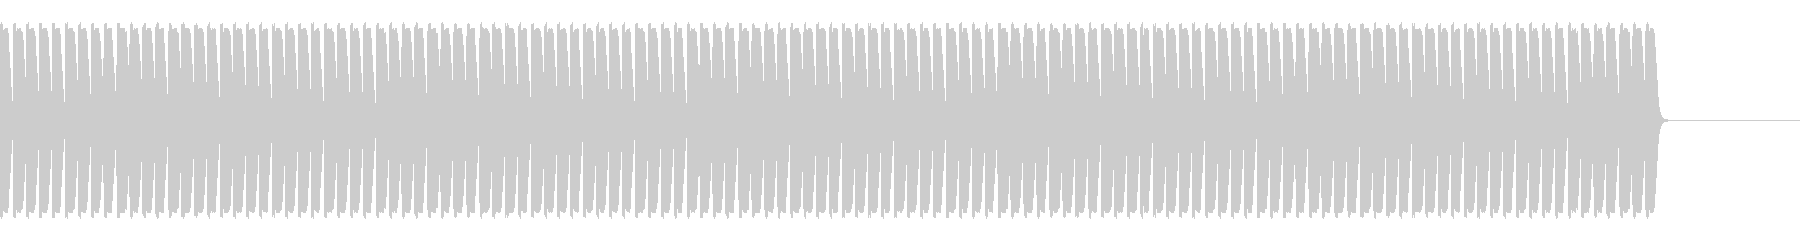 NGワード、放送禁止用語の未再生の波形